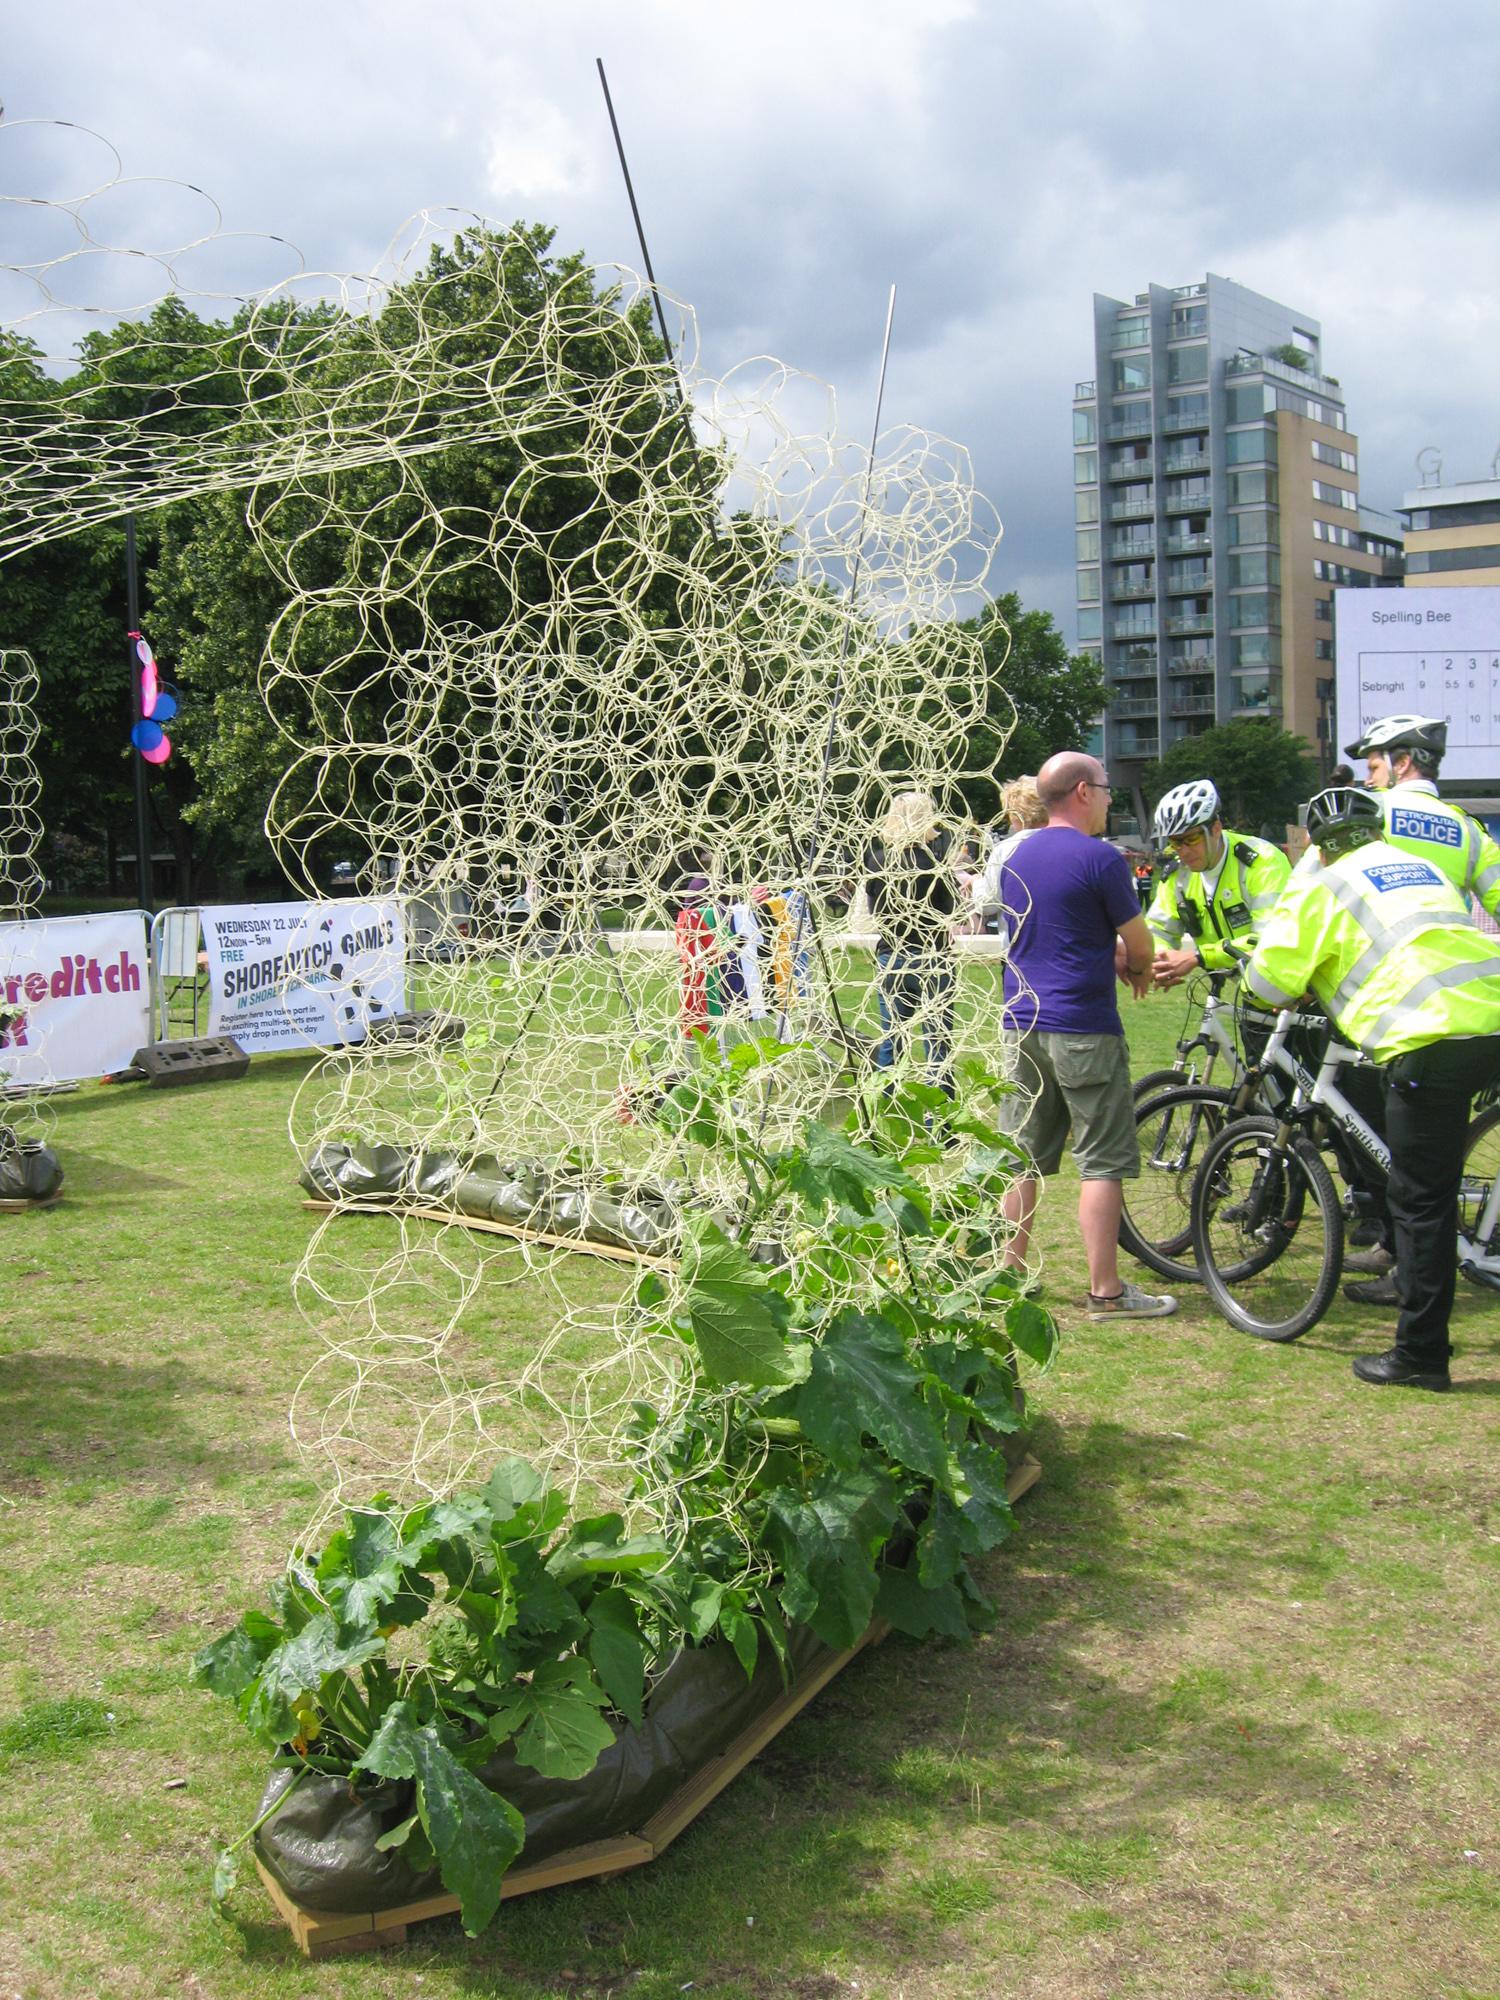 Shoreditch Gardens: Shoreditch Festival Pavilion